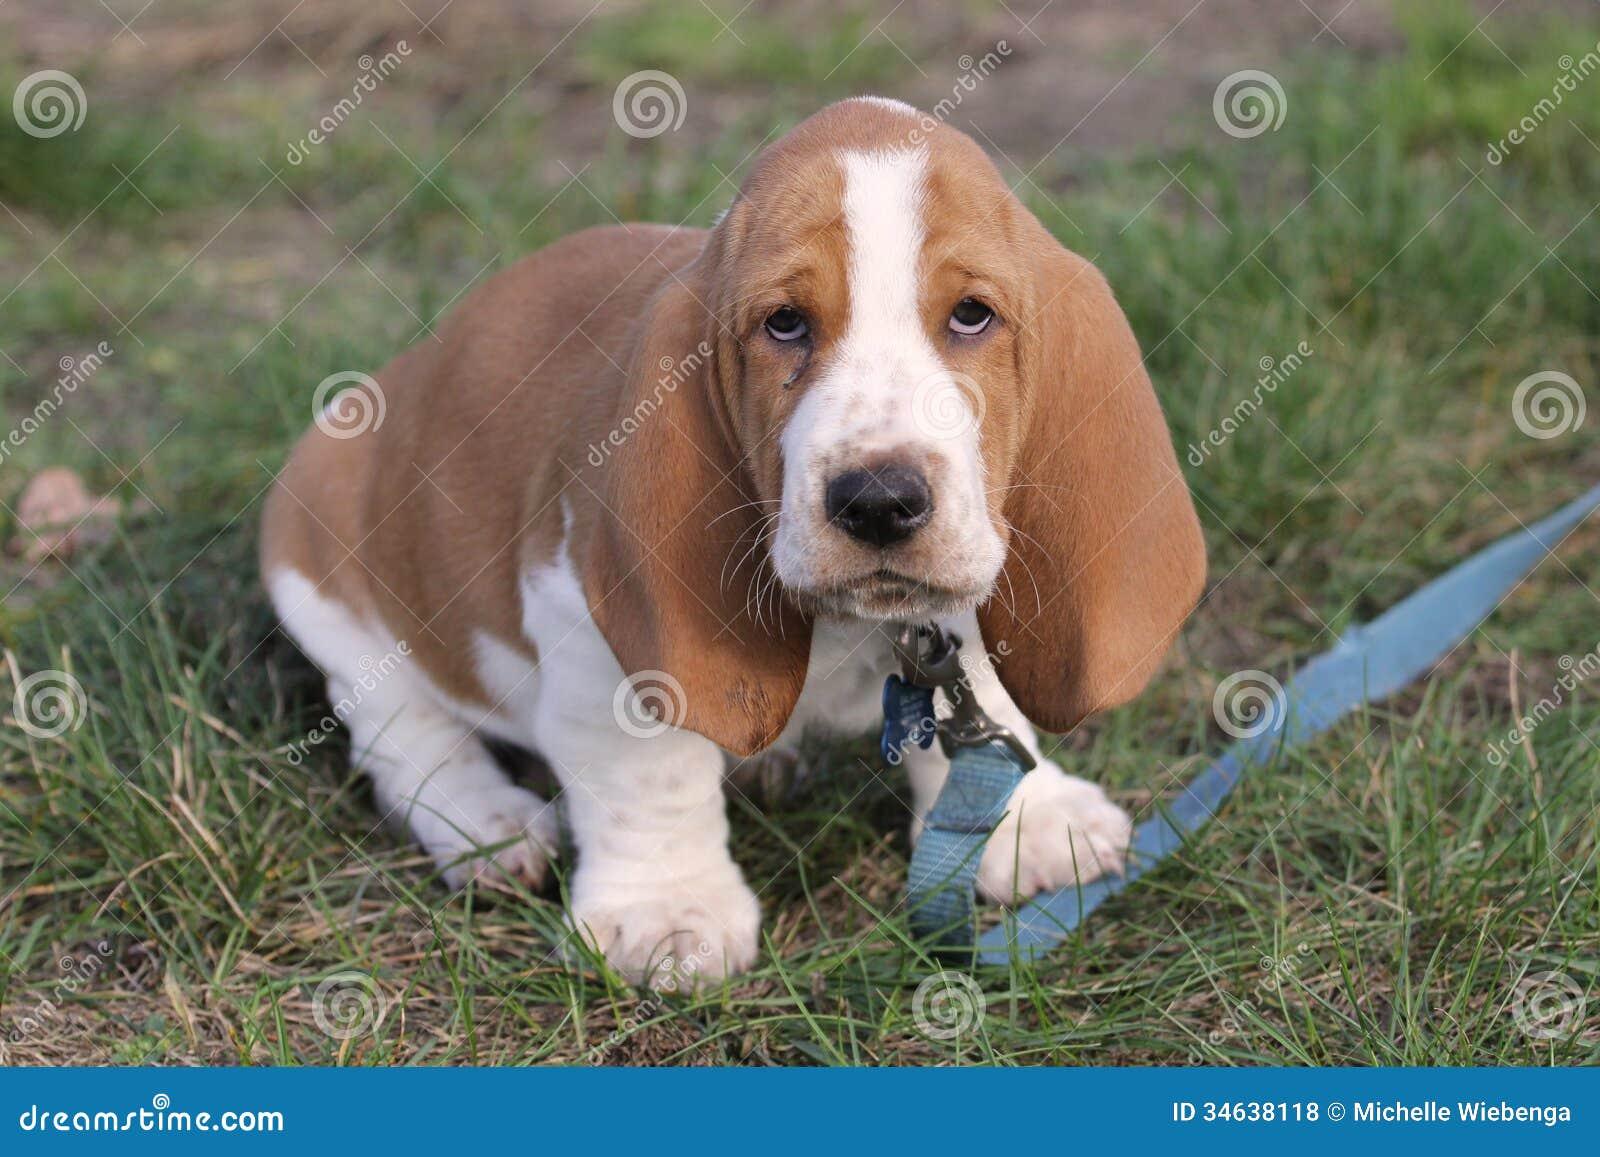 Basset Hound Puppy Royalty Free Stock Photos - Image: 34638118